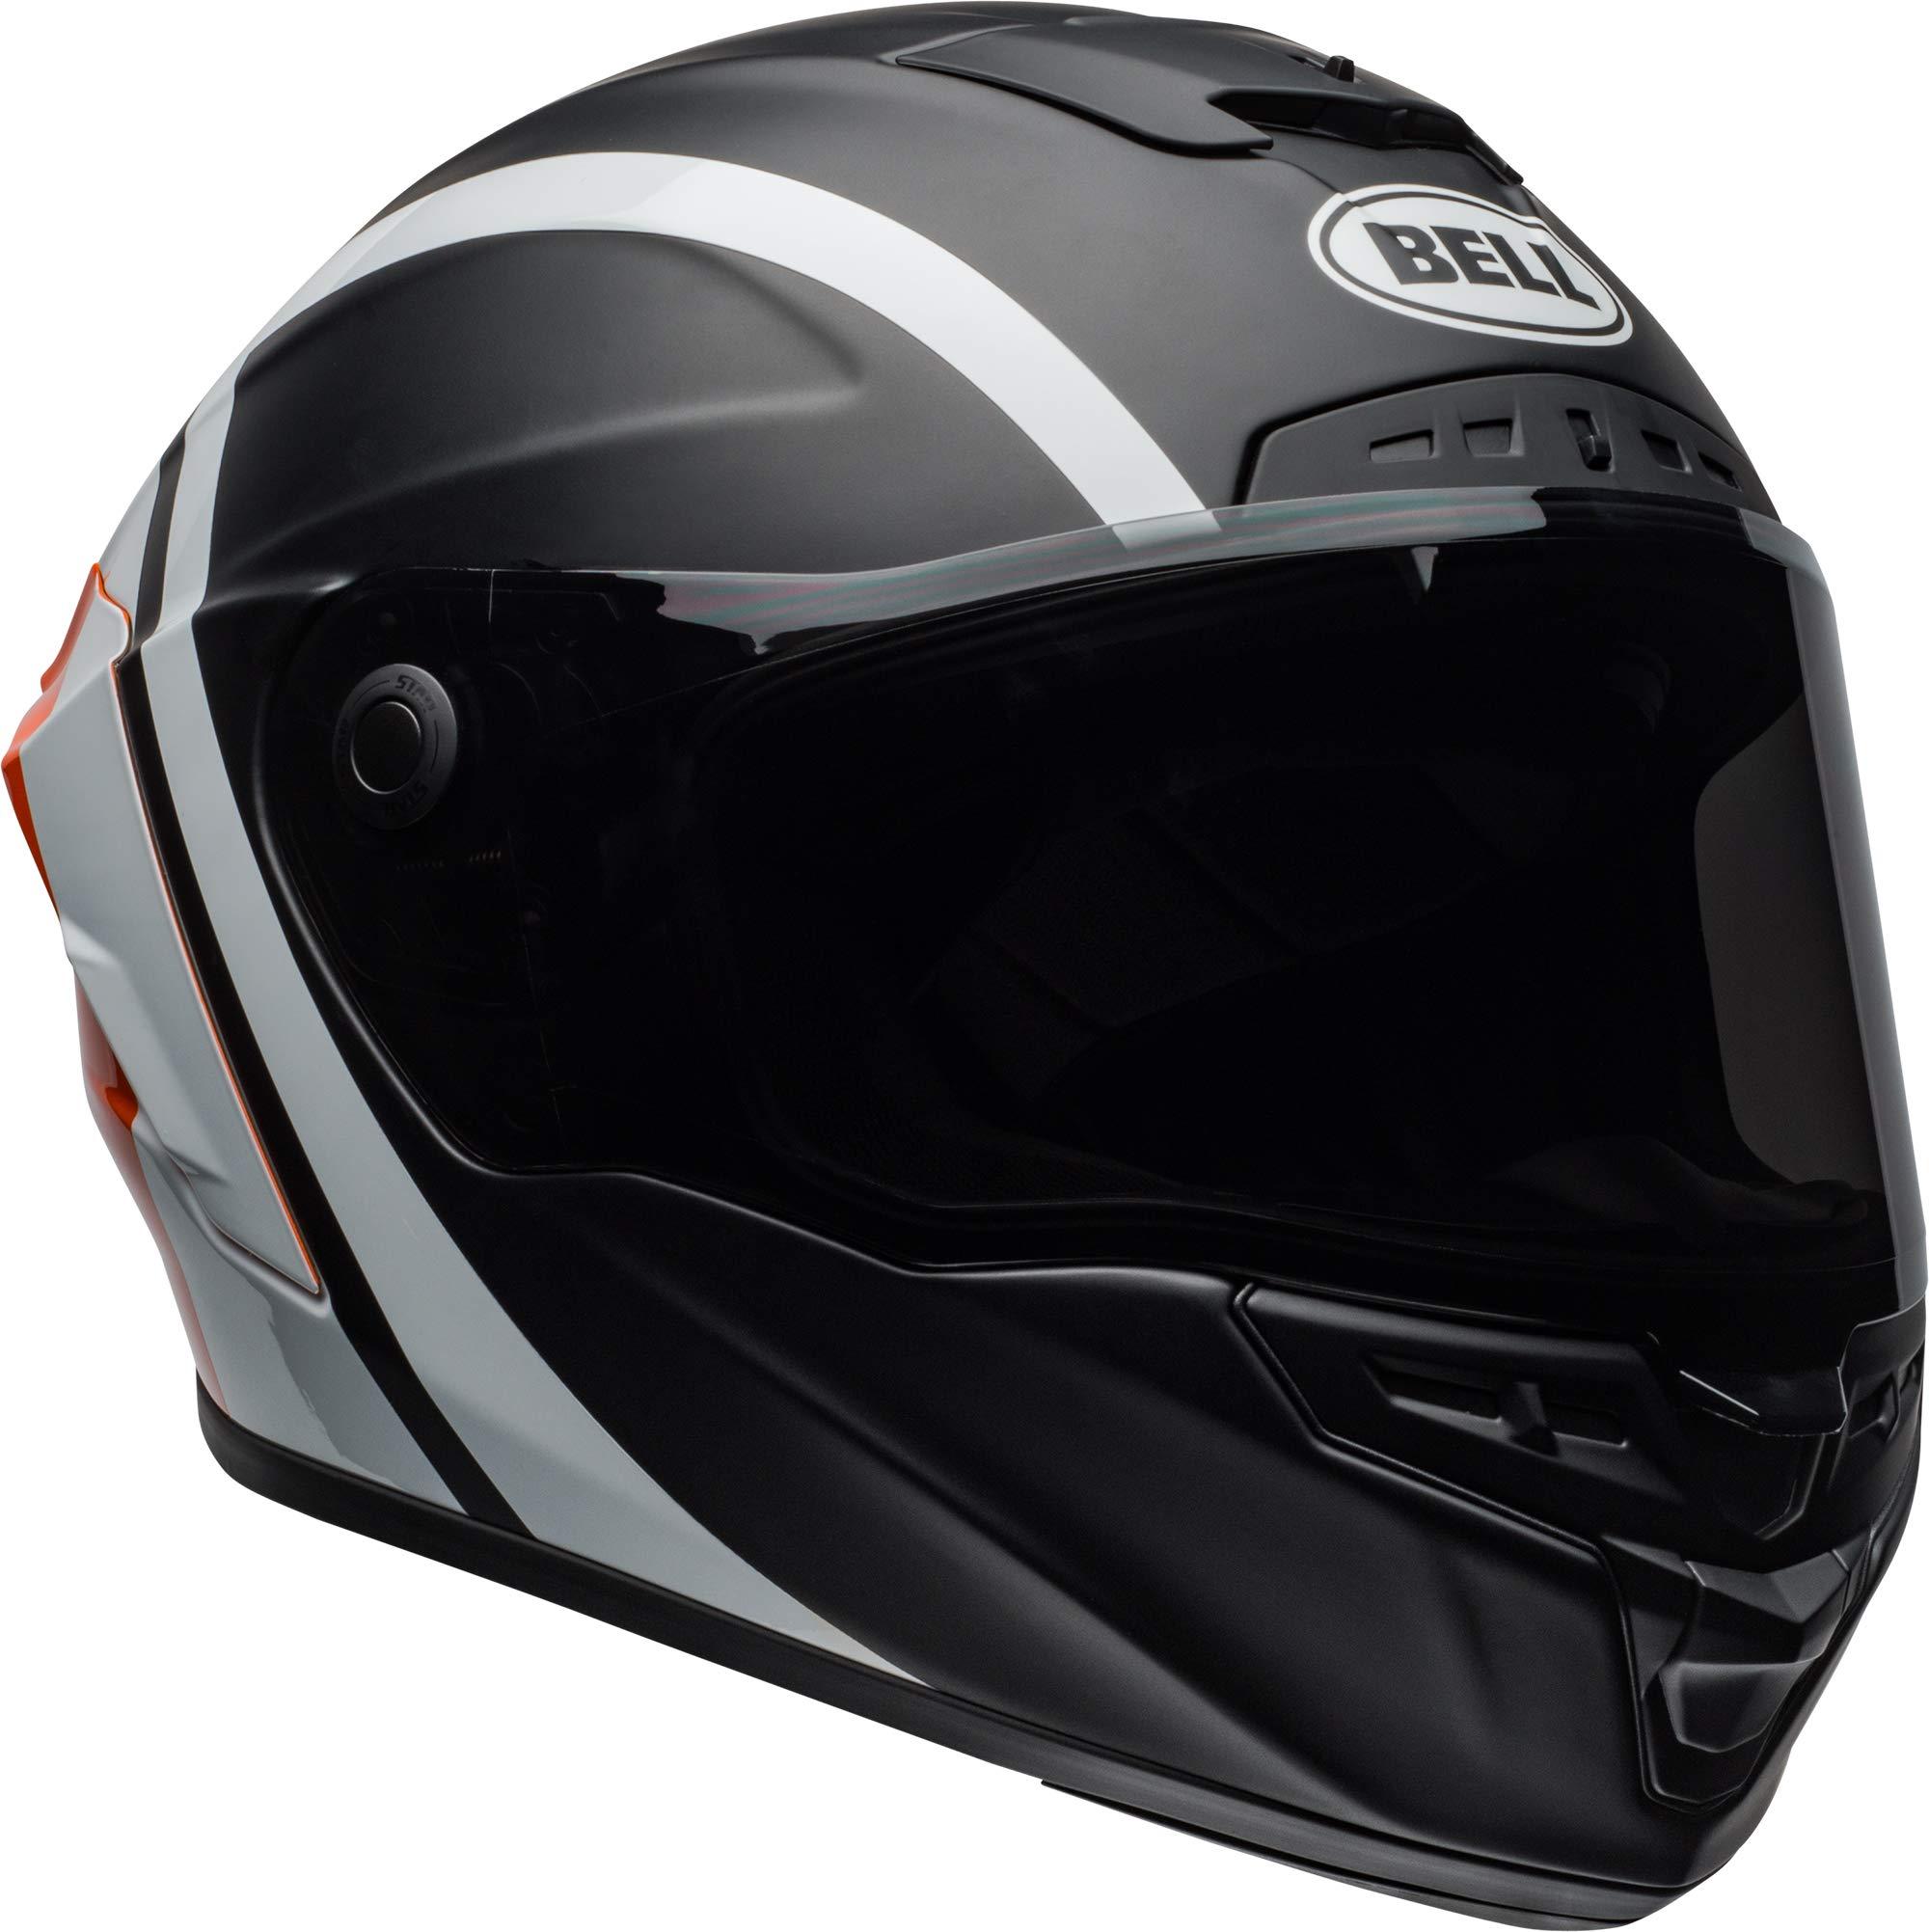 Bell Star MIPS Equipped Street Motorcycle Helmet (Tantrum Matte/Gloss Black/White/Orange, XX-Large)